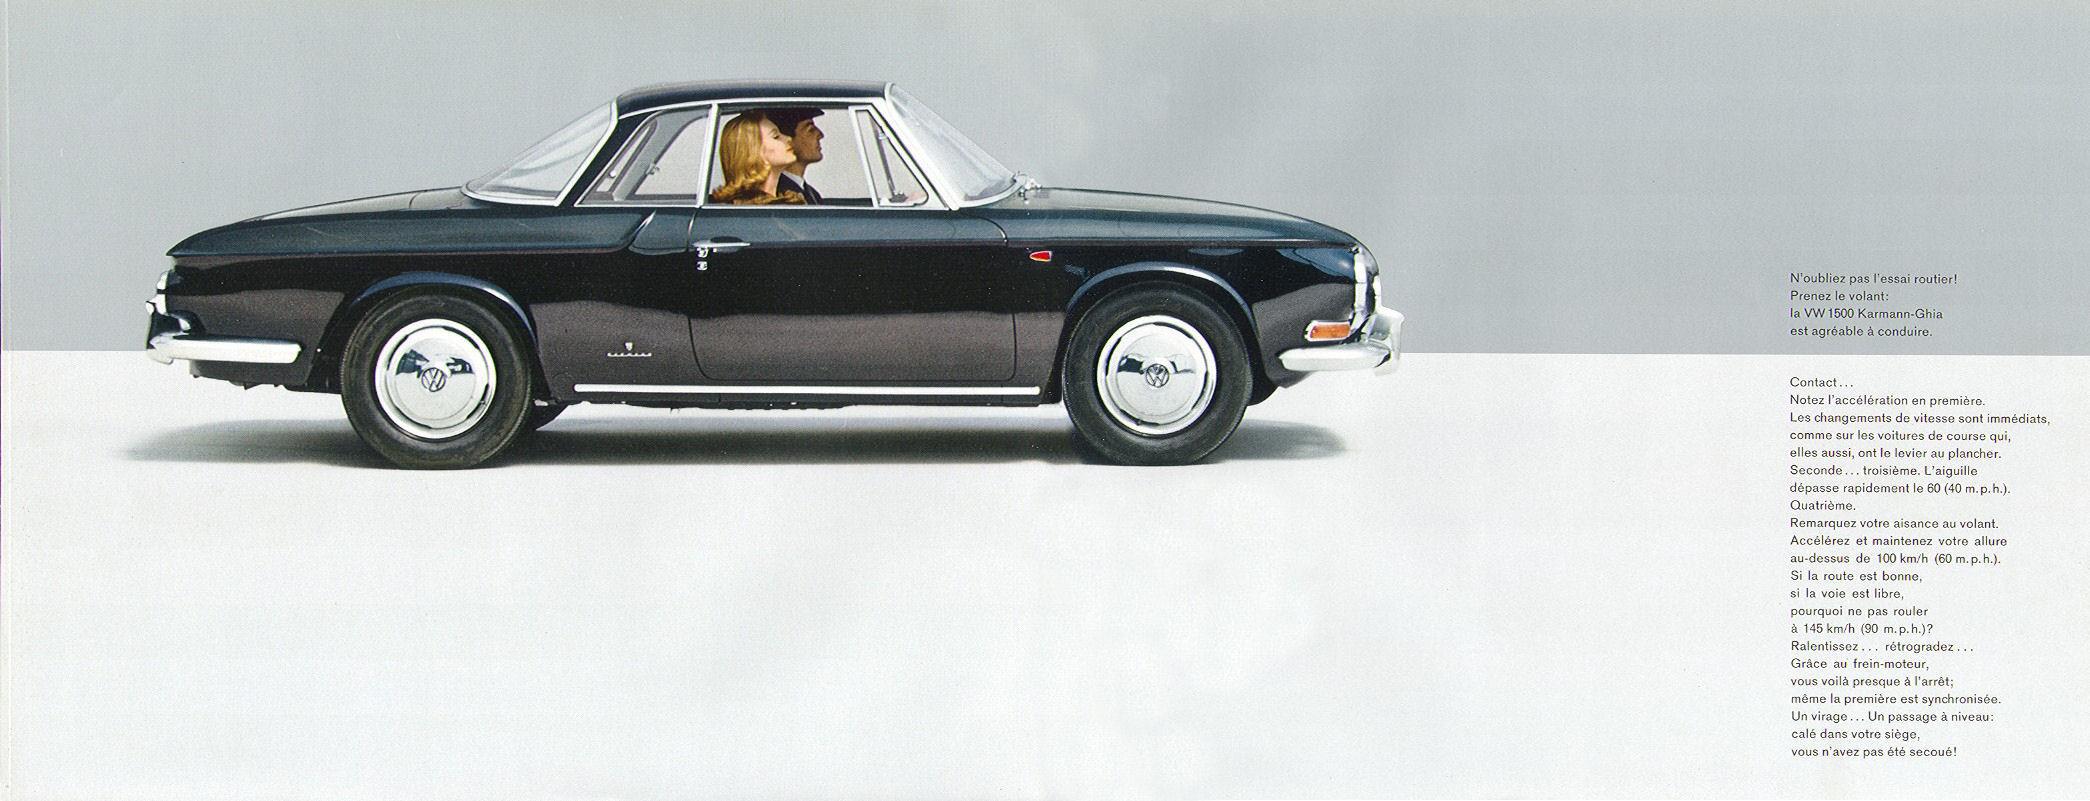 1963 Vw 1500 Karmann Ghia Brochure